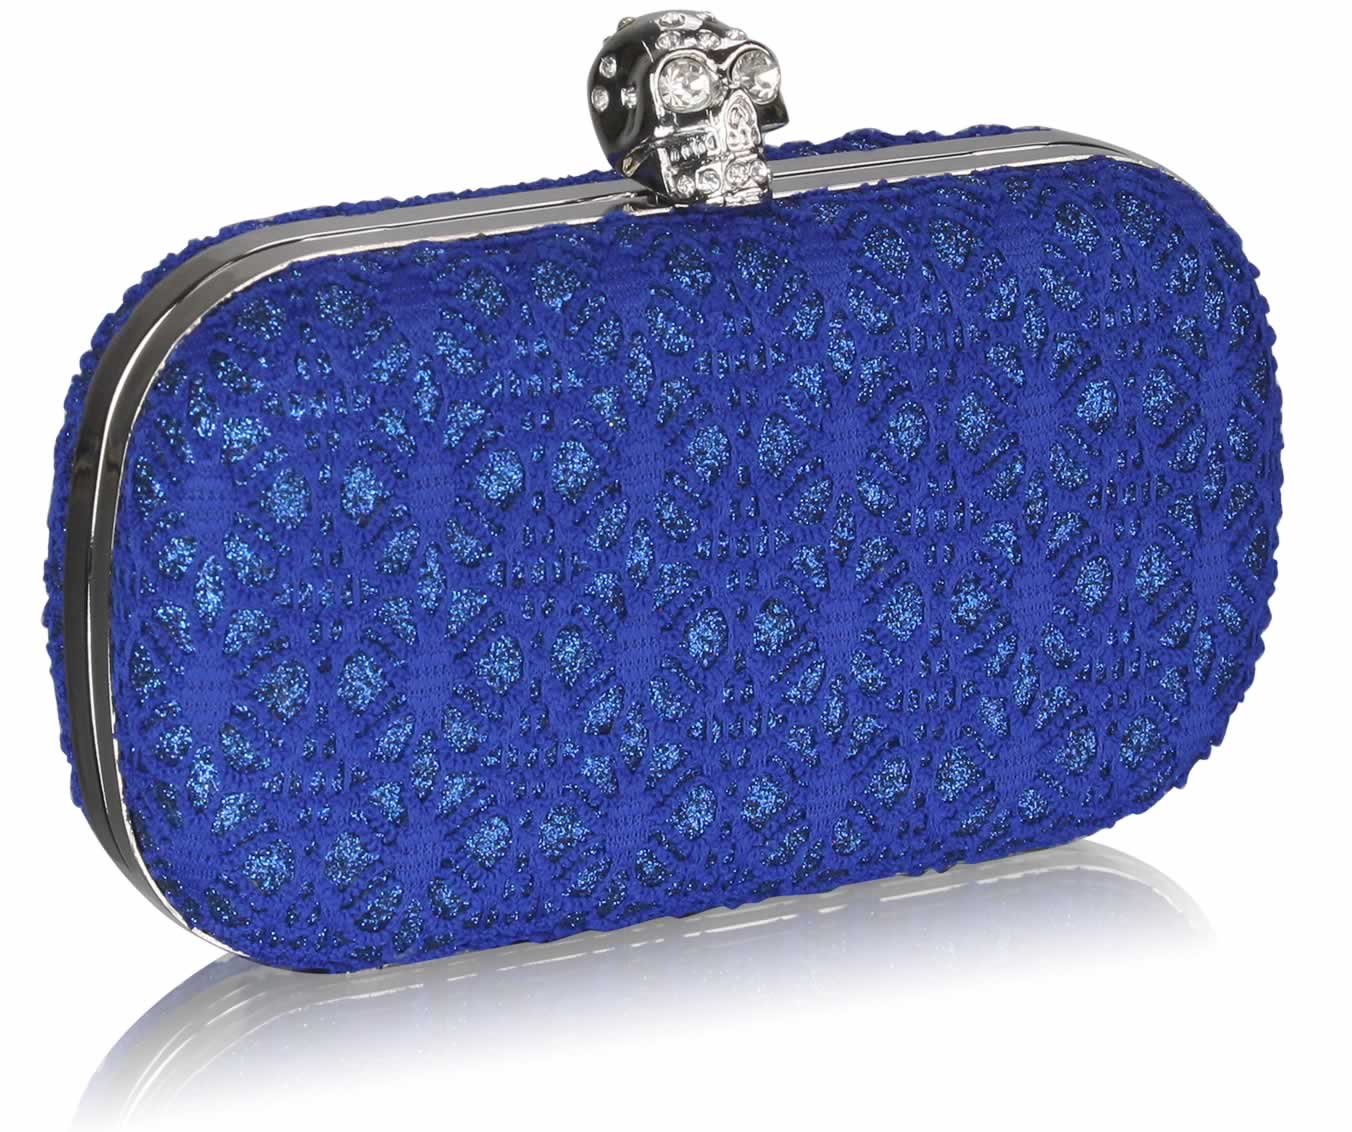 Blue Satin Evening Clutch Bag